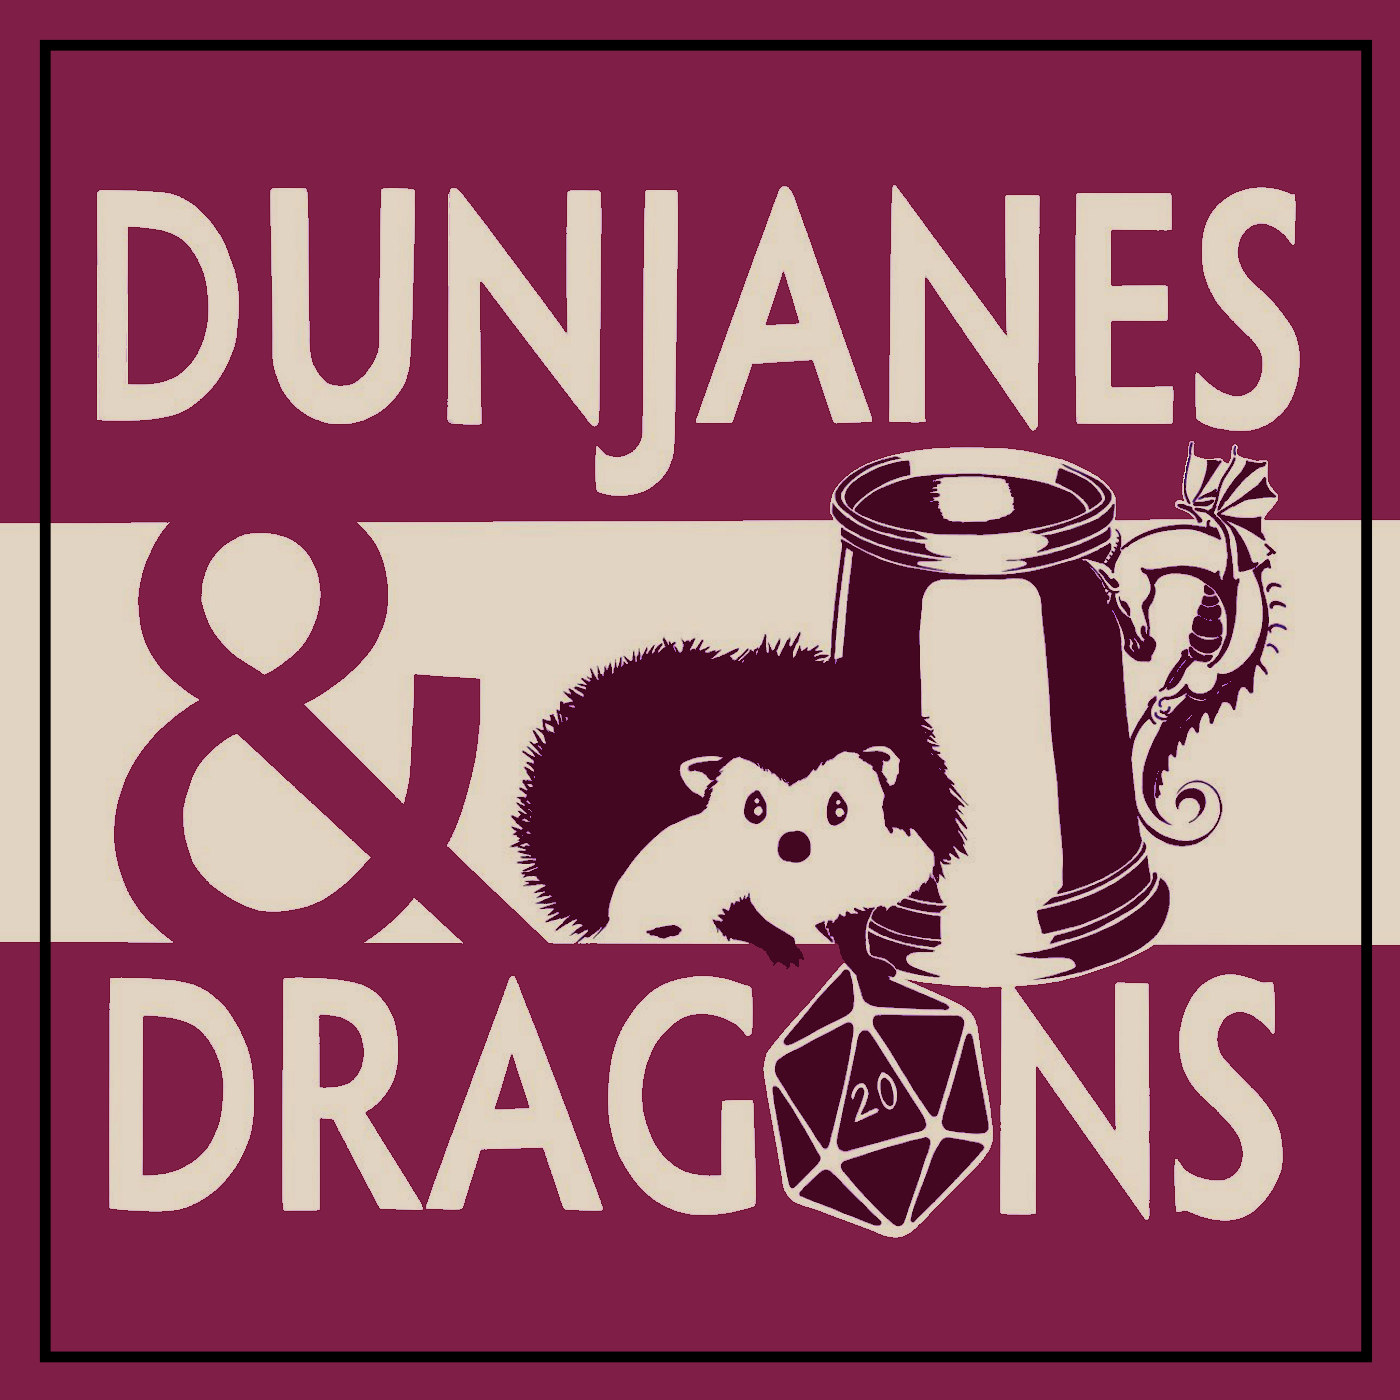 DunJanes and Dragons